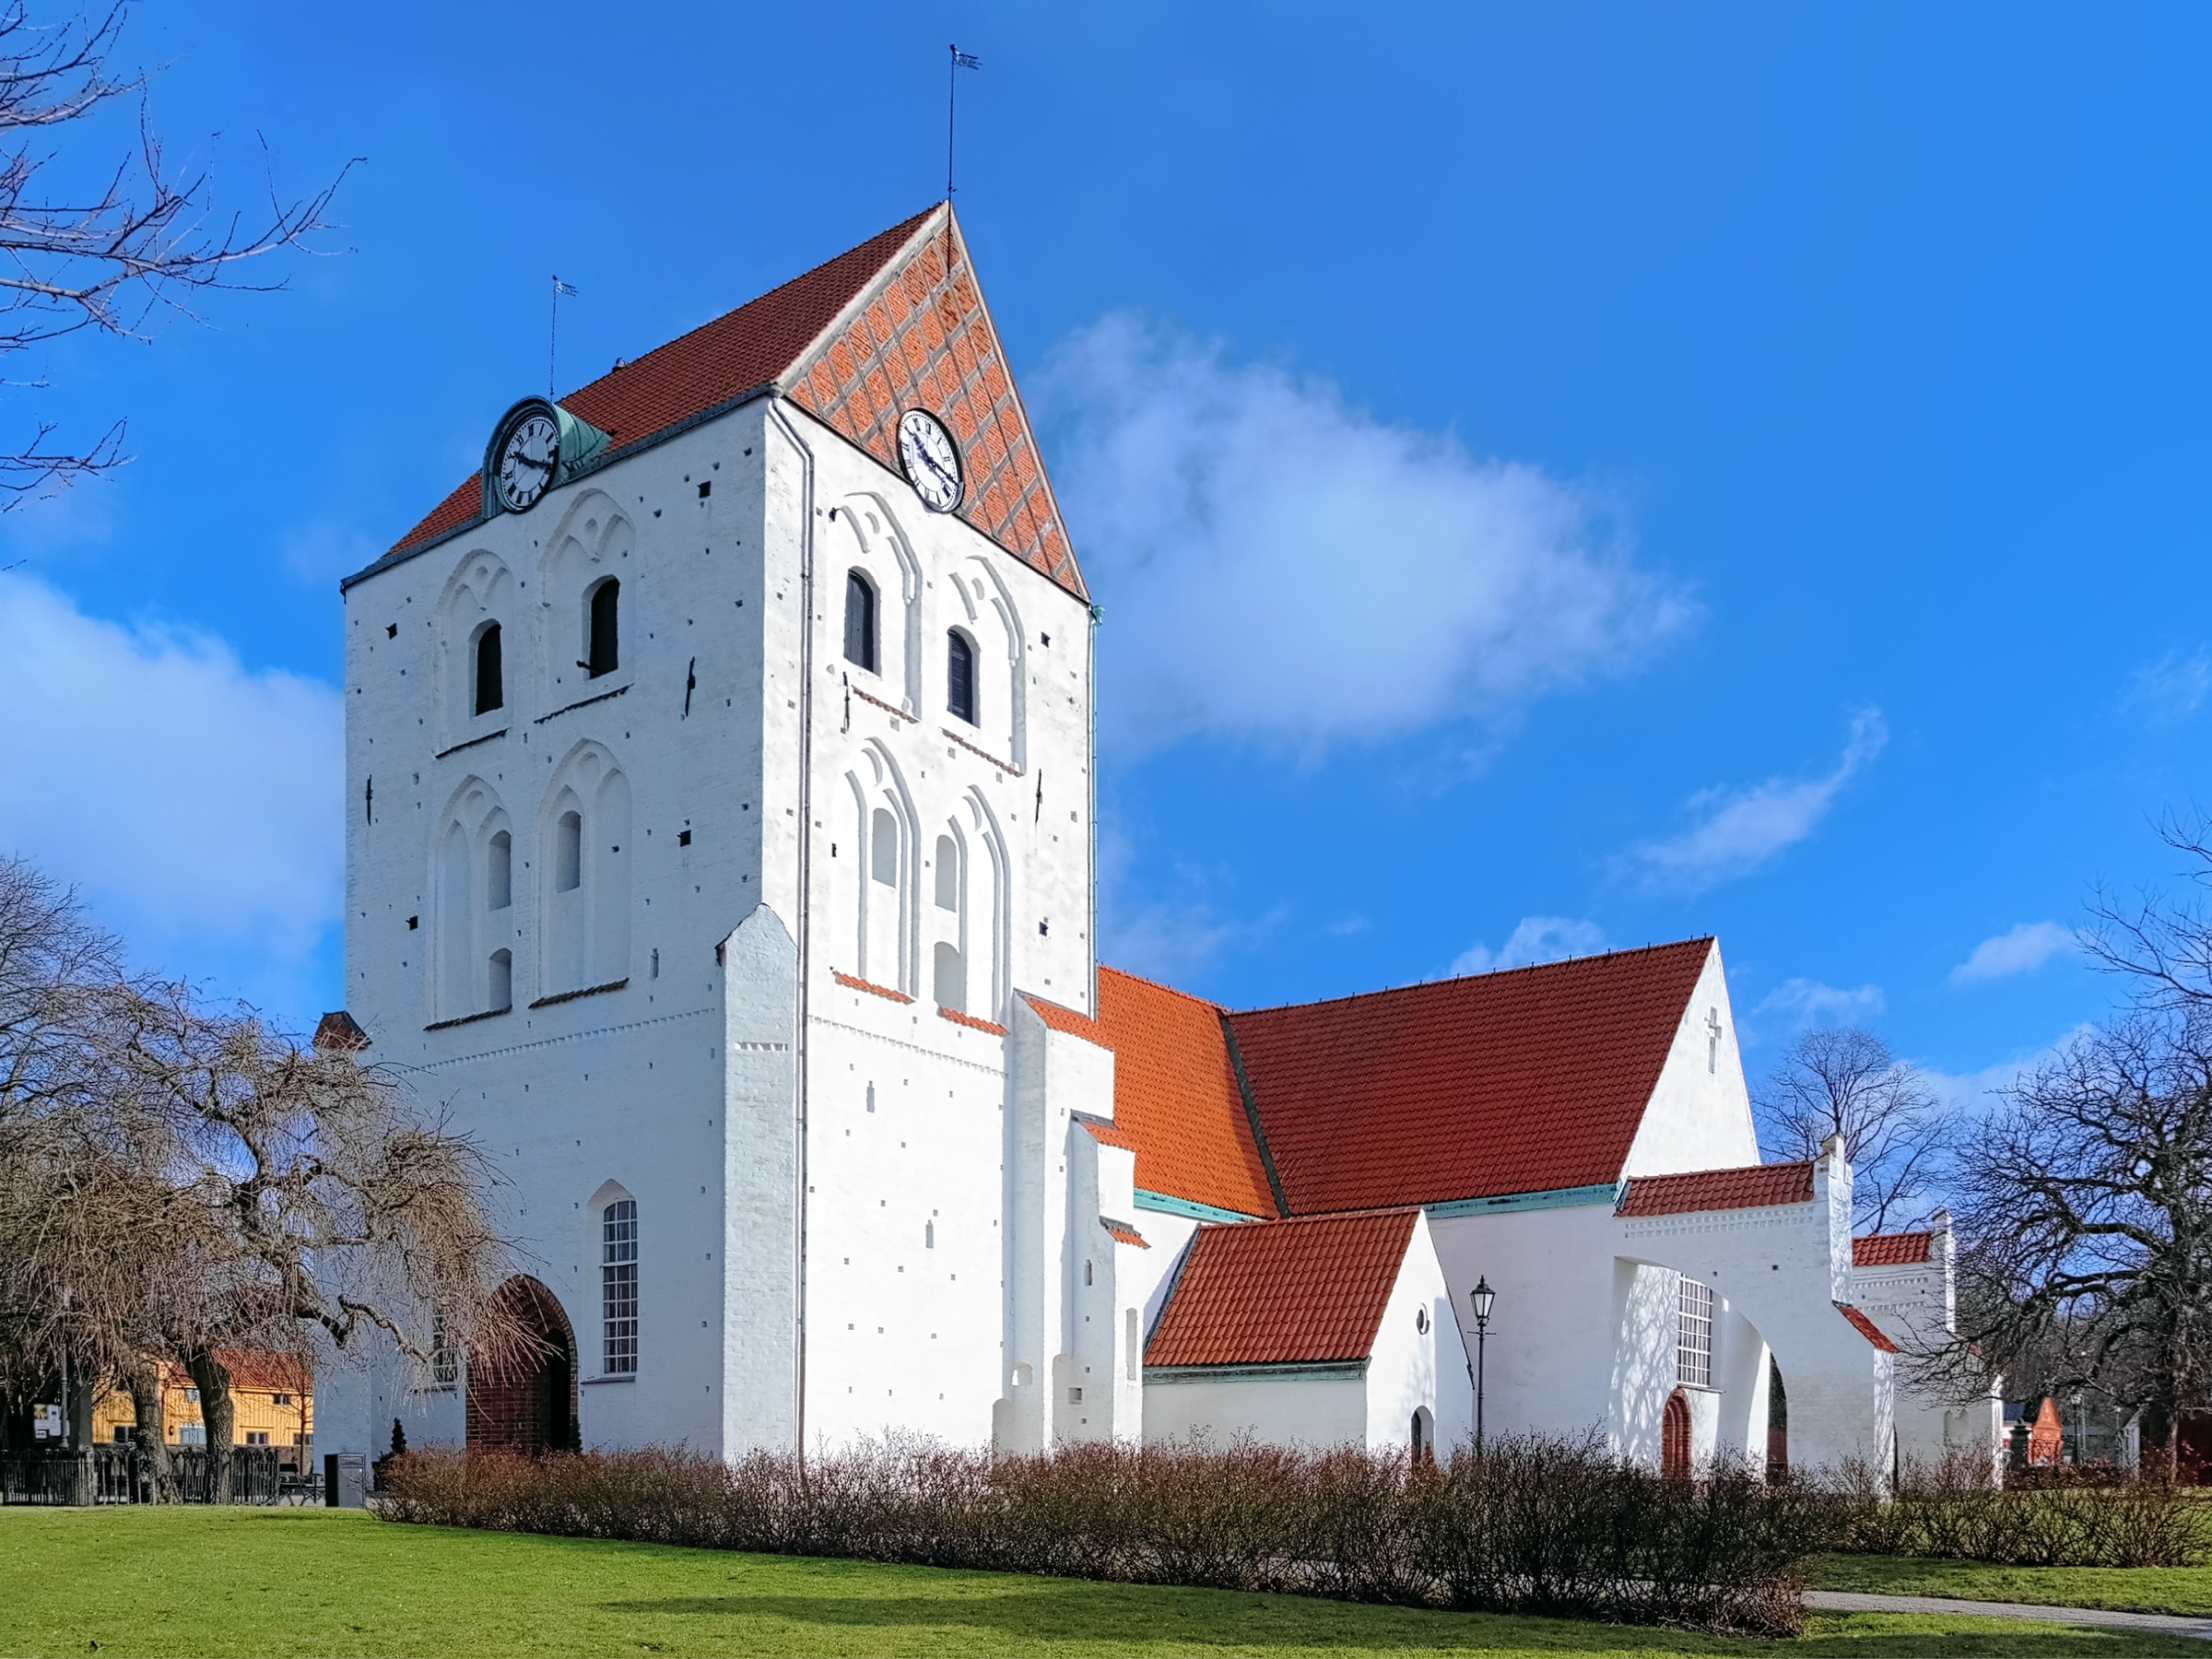 Ronneby, Blekinge County, Sweden